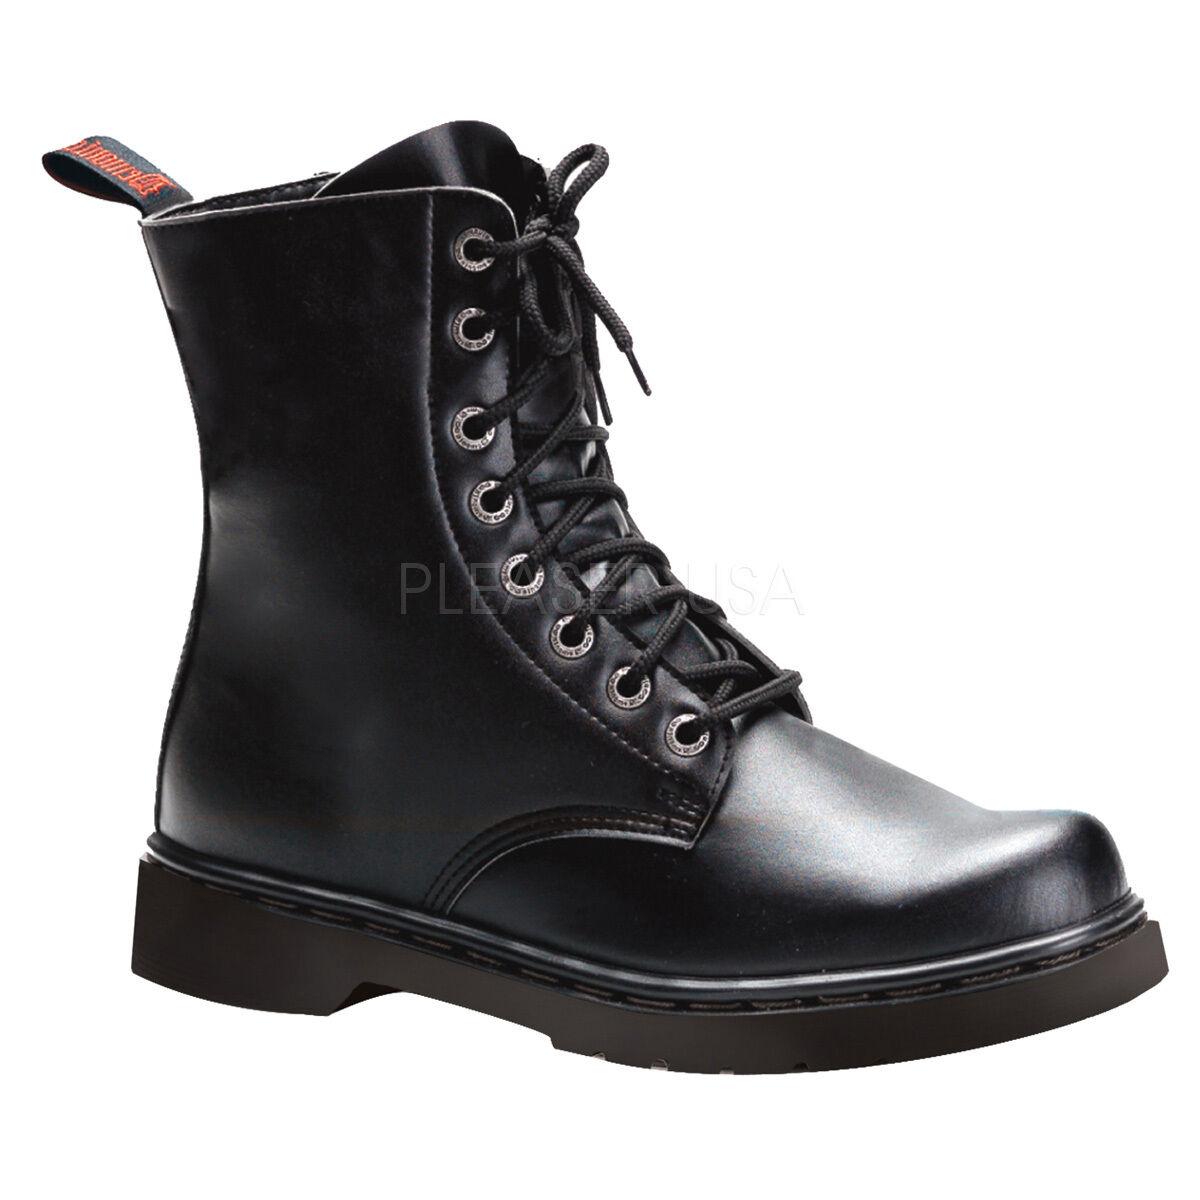 DEMONIA Women's Punk Goth Military Combat 1  Heel 8 Eyelet Ankle Boots